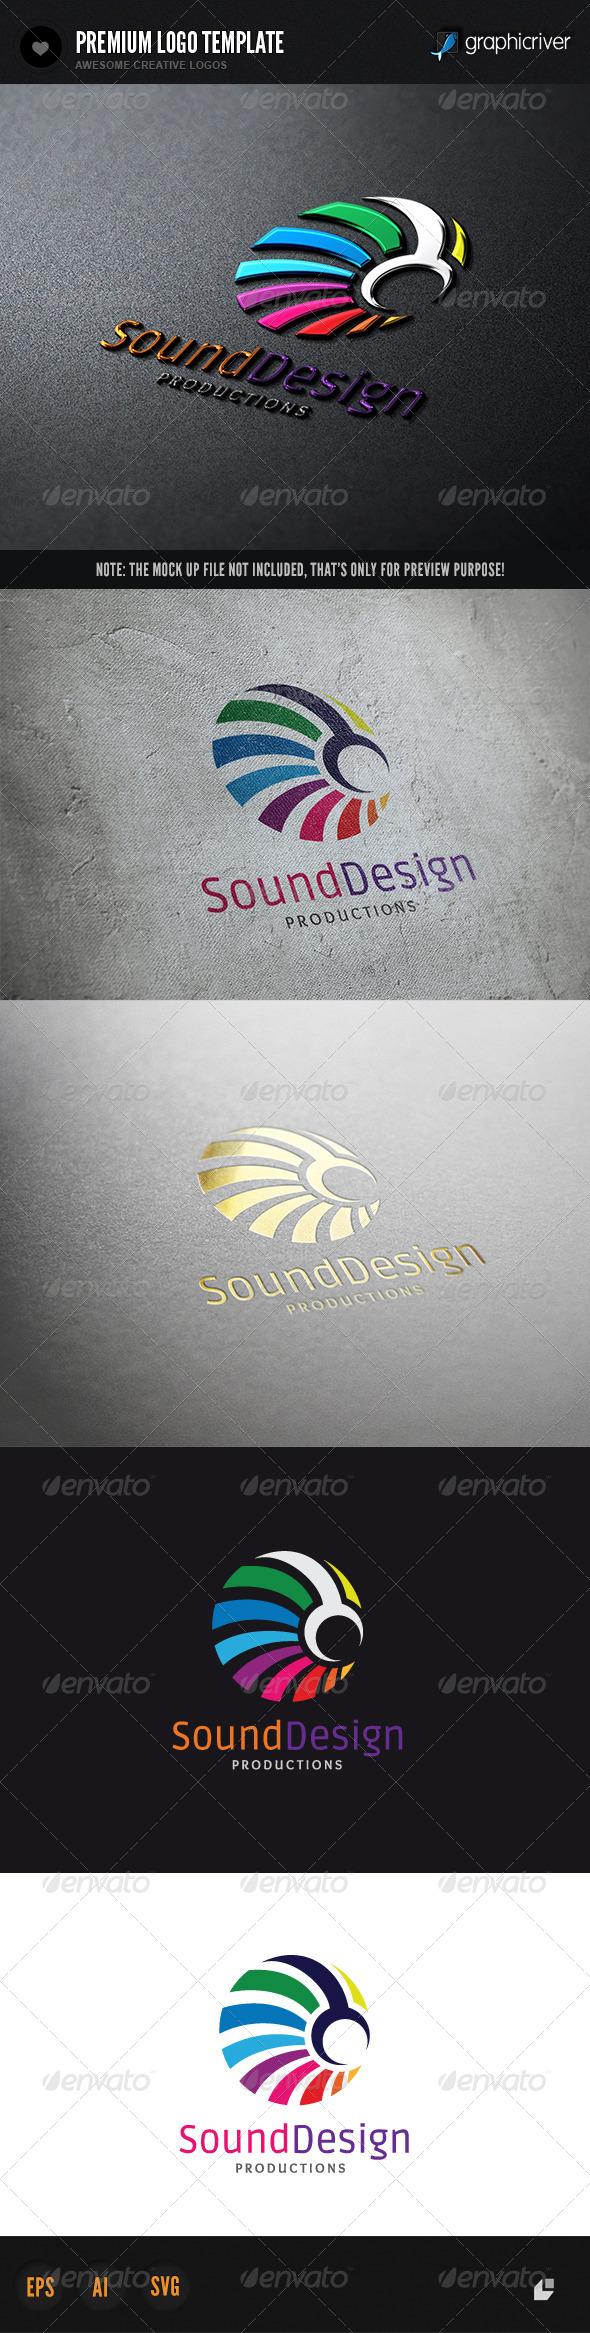 GraphicRiver Sound Design 6486729